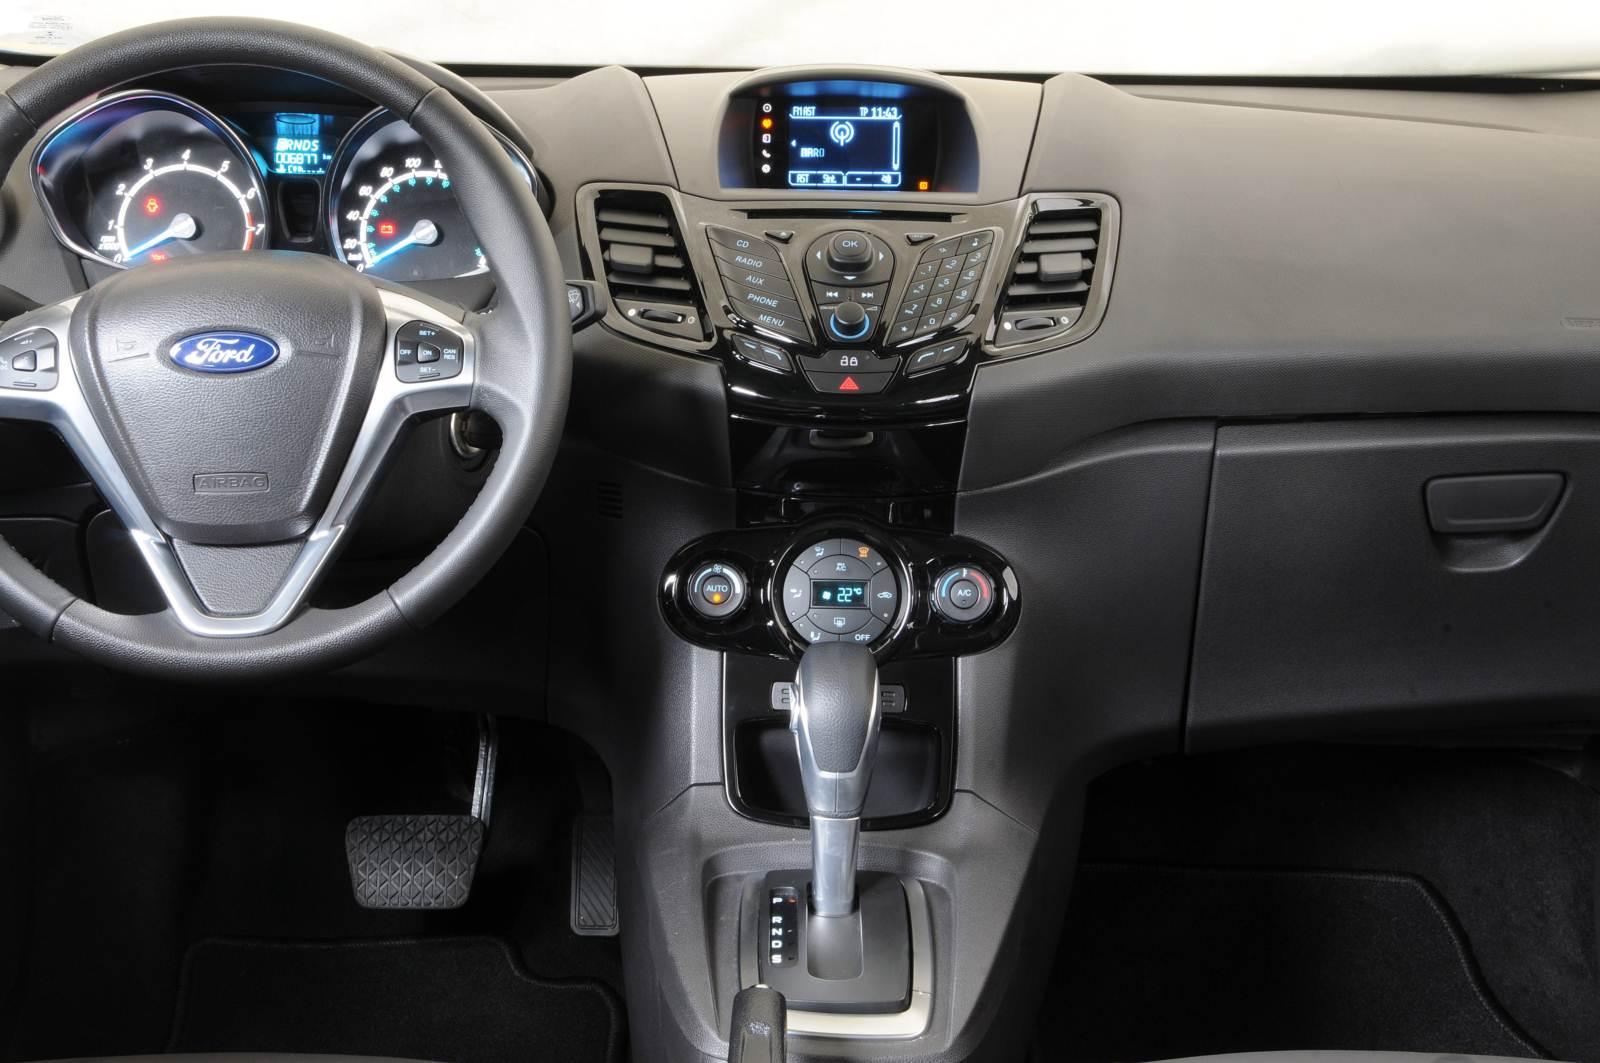 Ford New Fiesta 2015  - interior